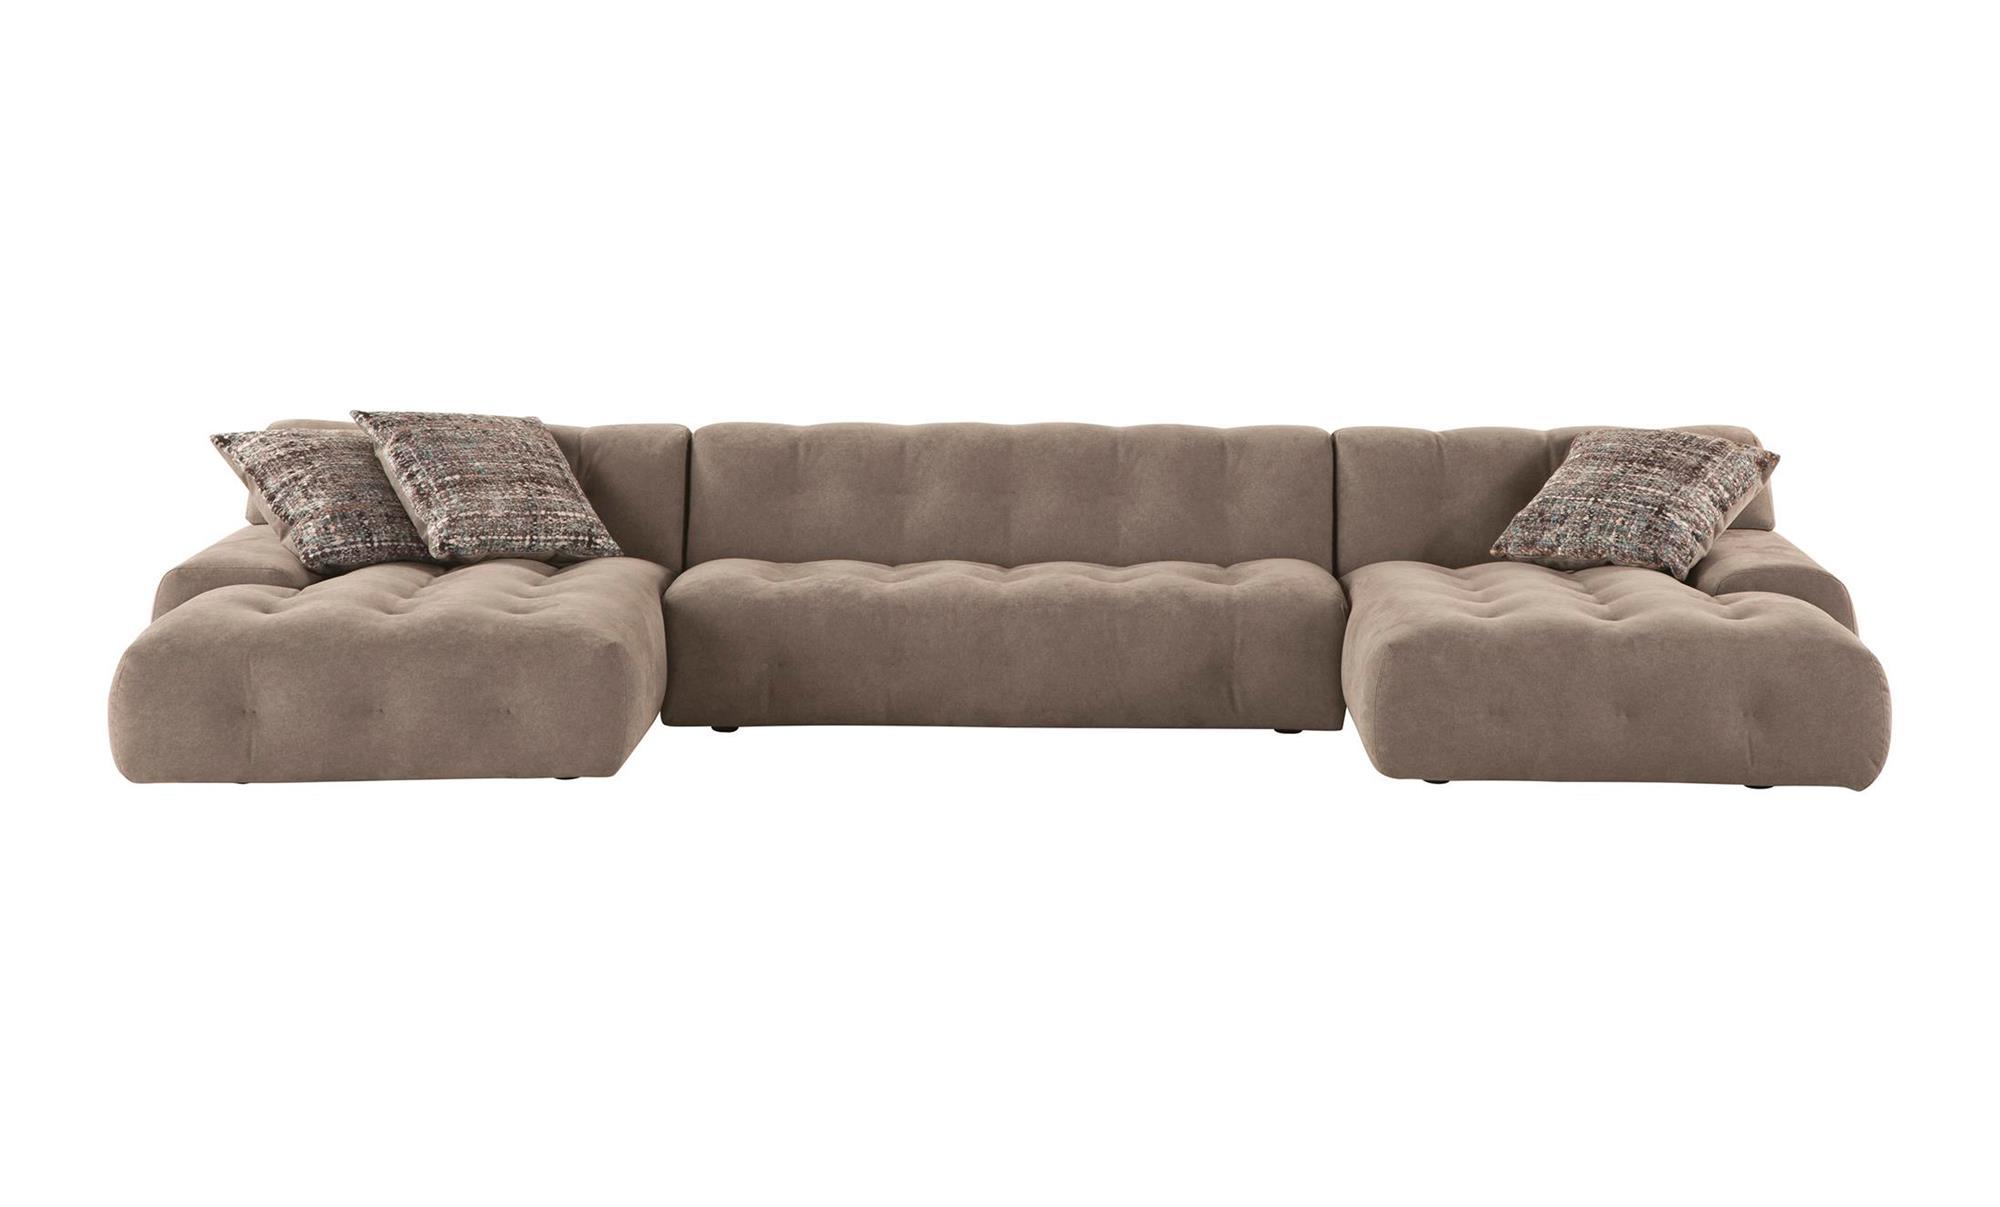 Sofa Suelo Tldn 30 sofà S Para El Salà N